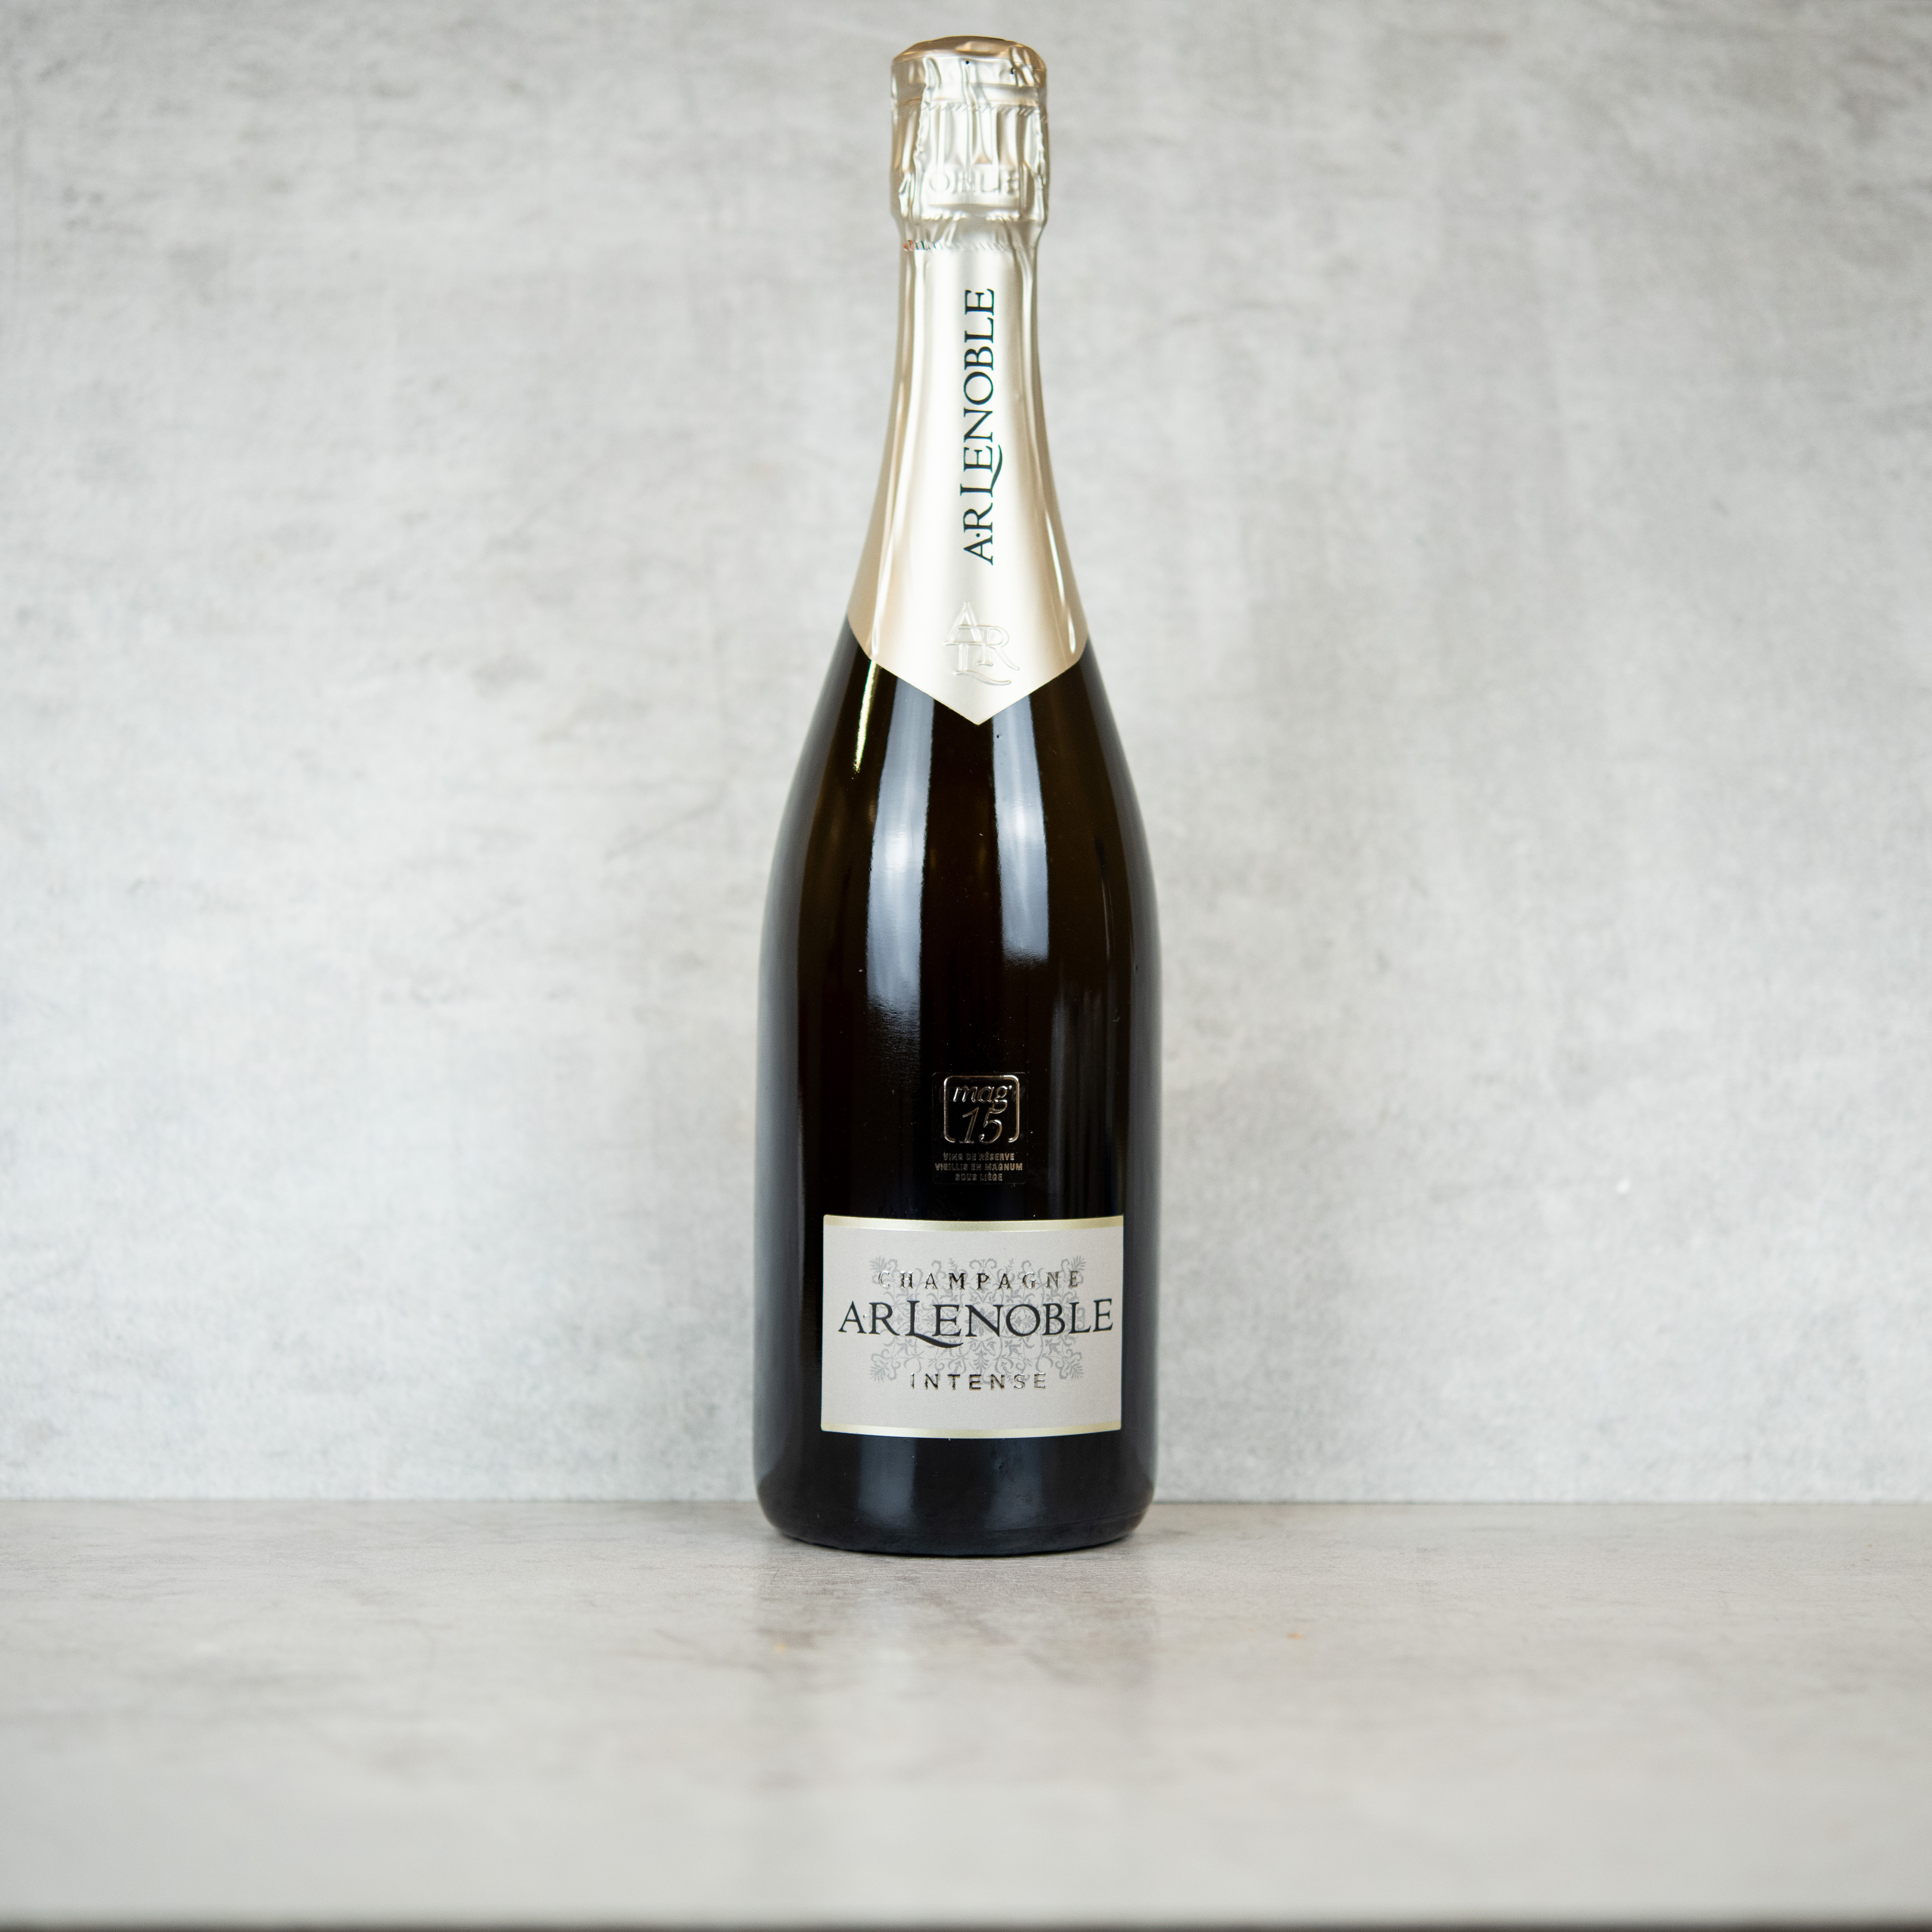 mh20-champagner-a.-r.-lenoble-brut-intense-075-liter-flasche-markthalle20-1